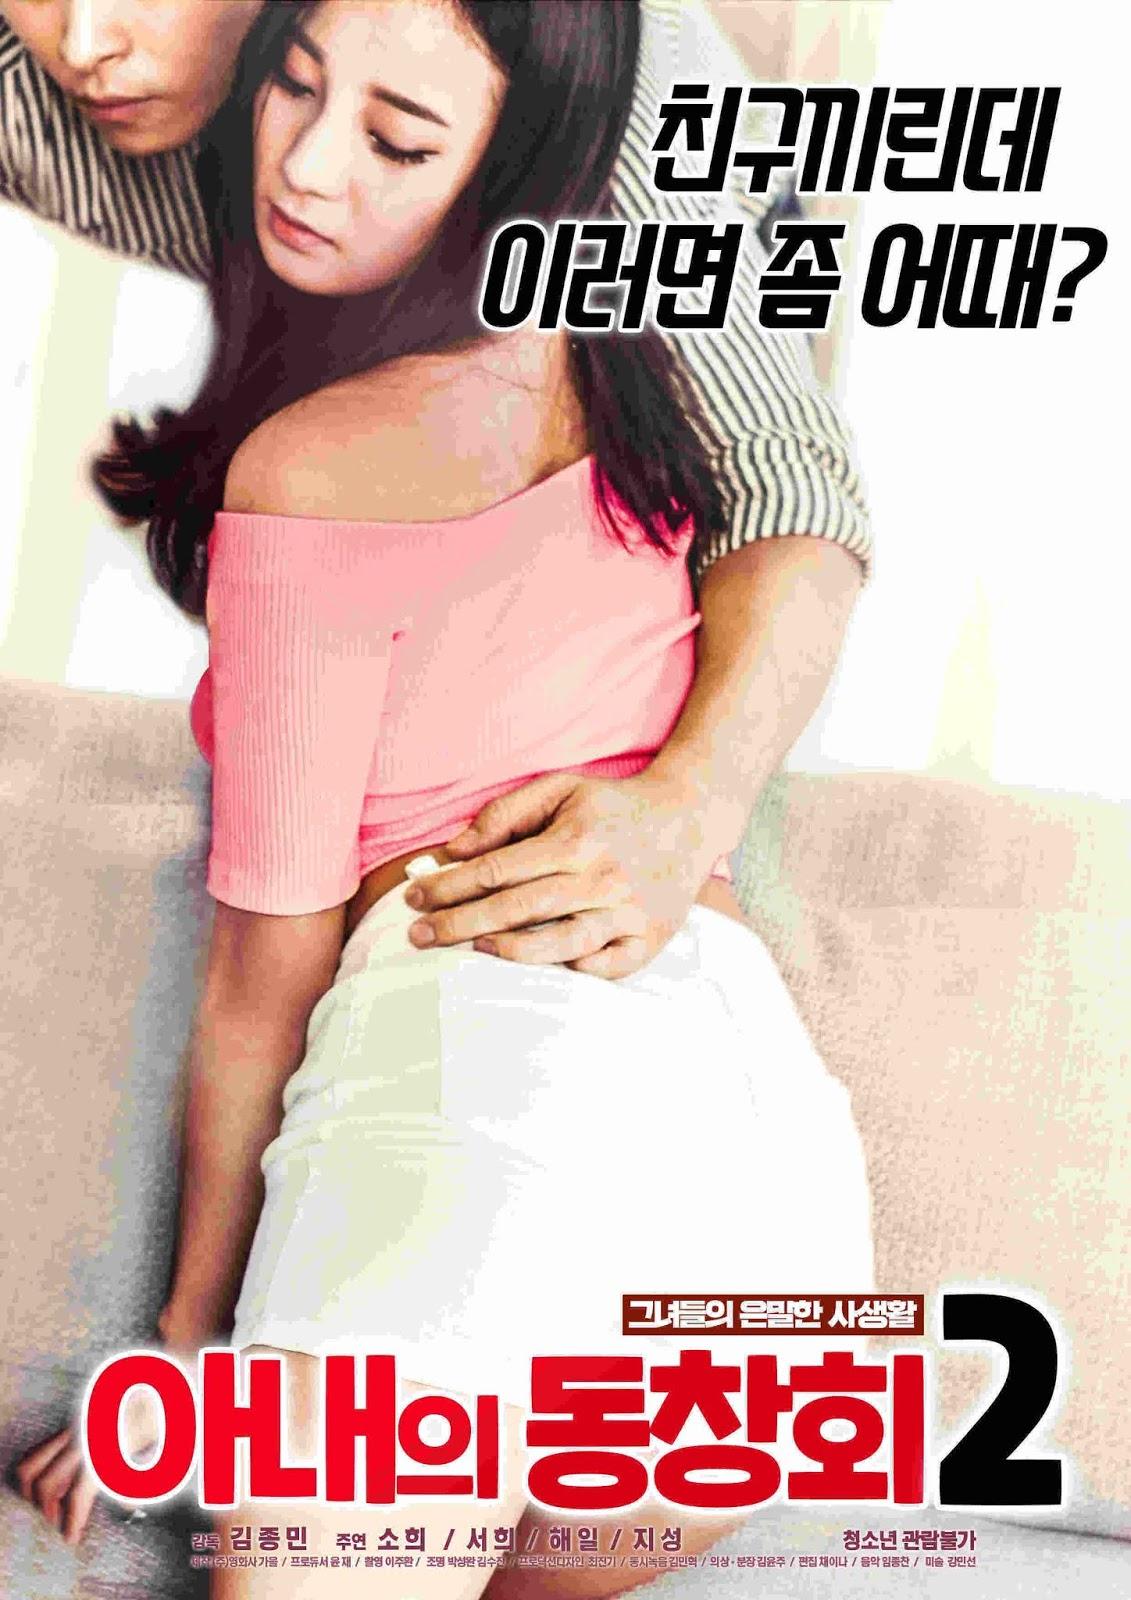 Wife Friend Reunion 2 Full Korea 18+ Adult Movie Online Free